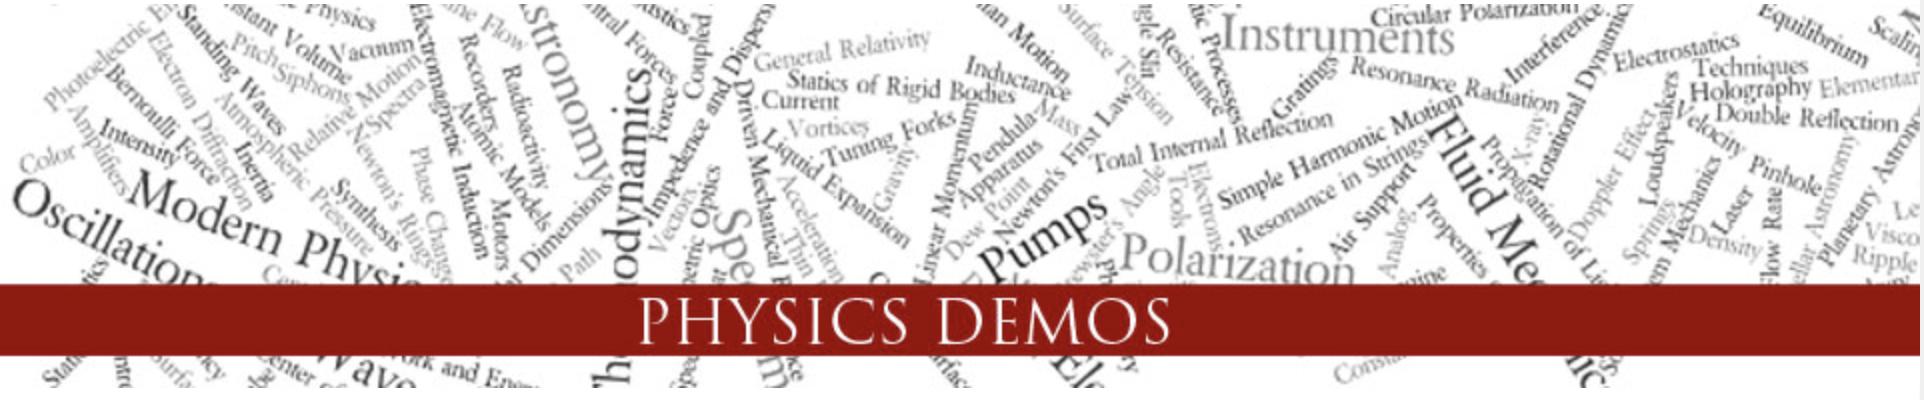 Physics Demos